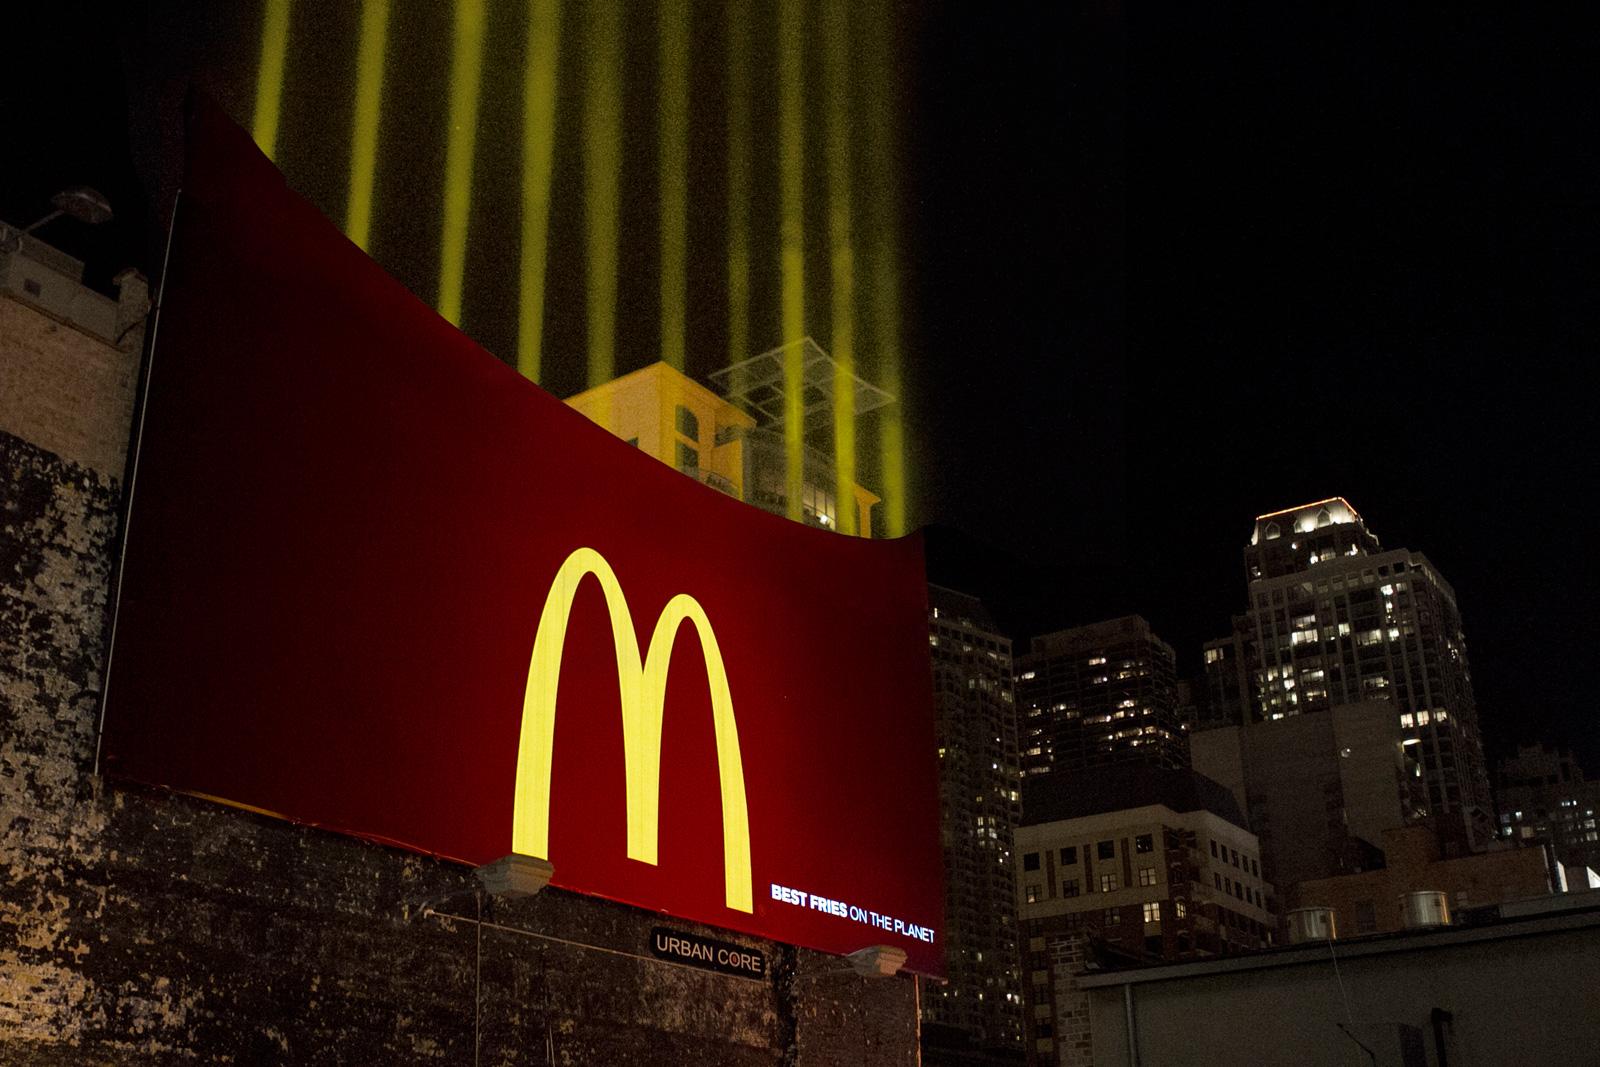 McDonalds Fry Light